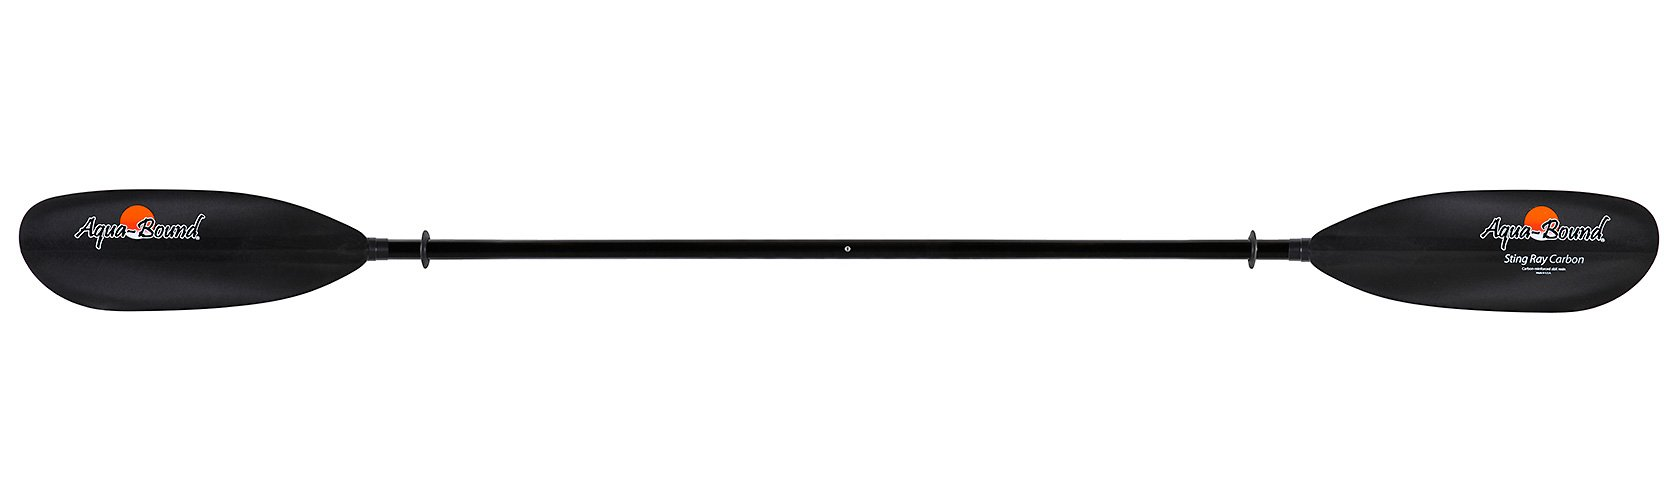 Aqua-Bound Sting Ray Carbon 2-Piece Snap-Button Kayak Paddle